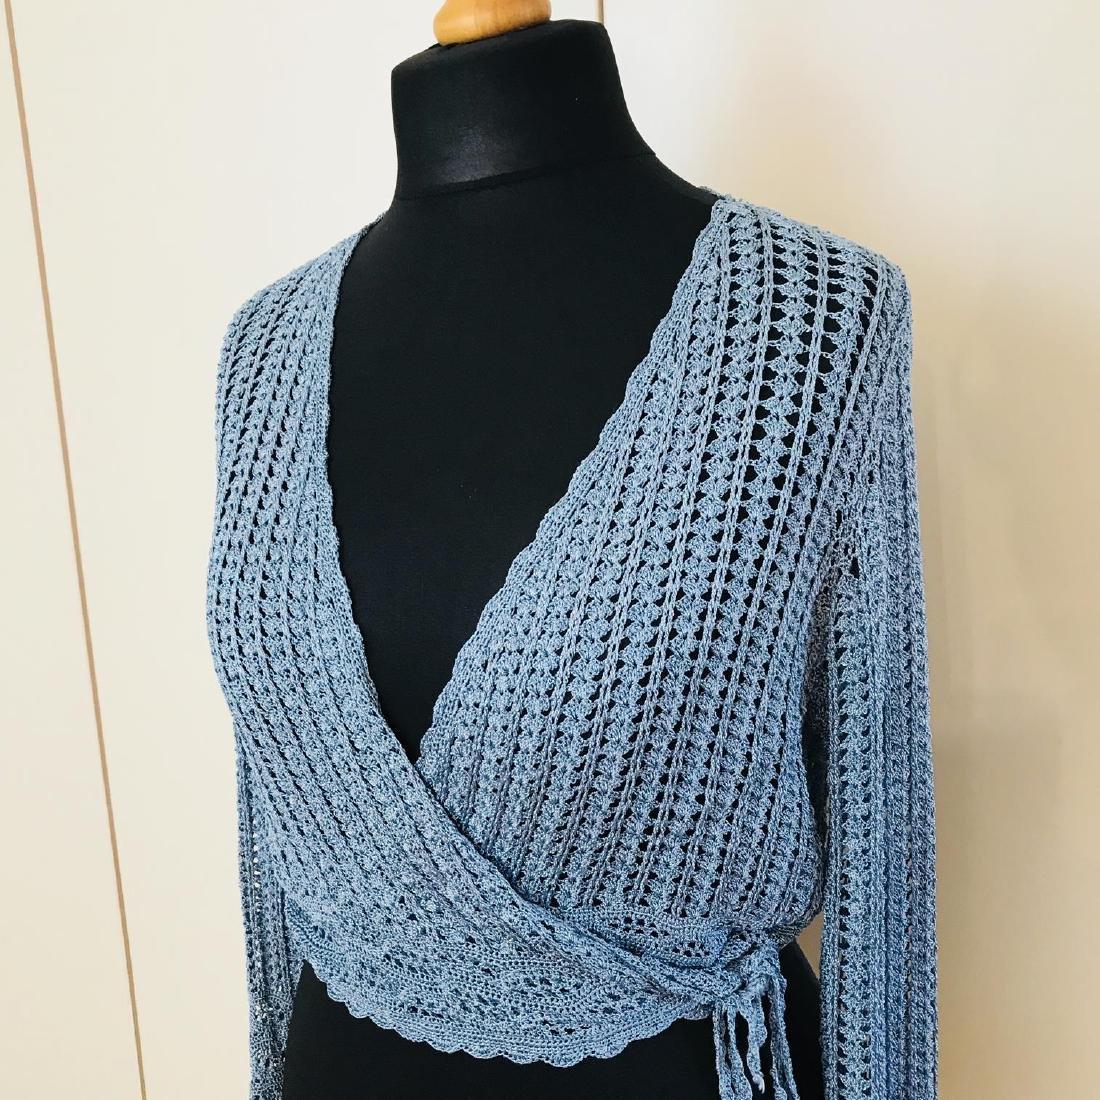 Vintage Women's Designer Sweater Cardigan Top Size US 6 - 2